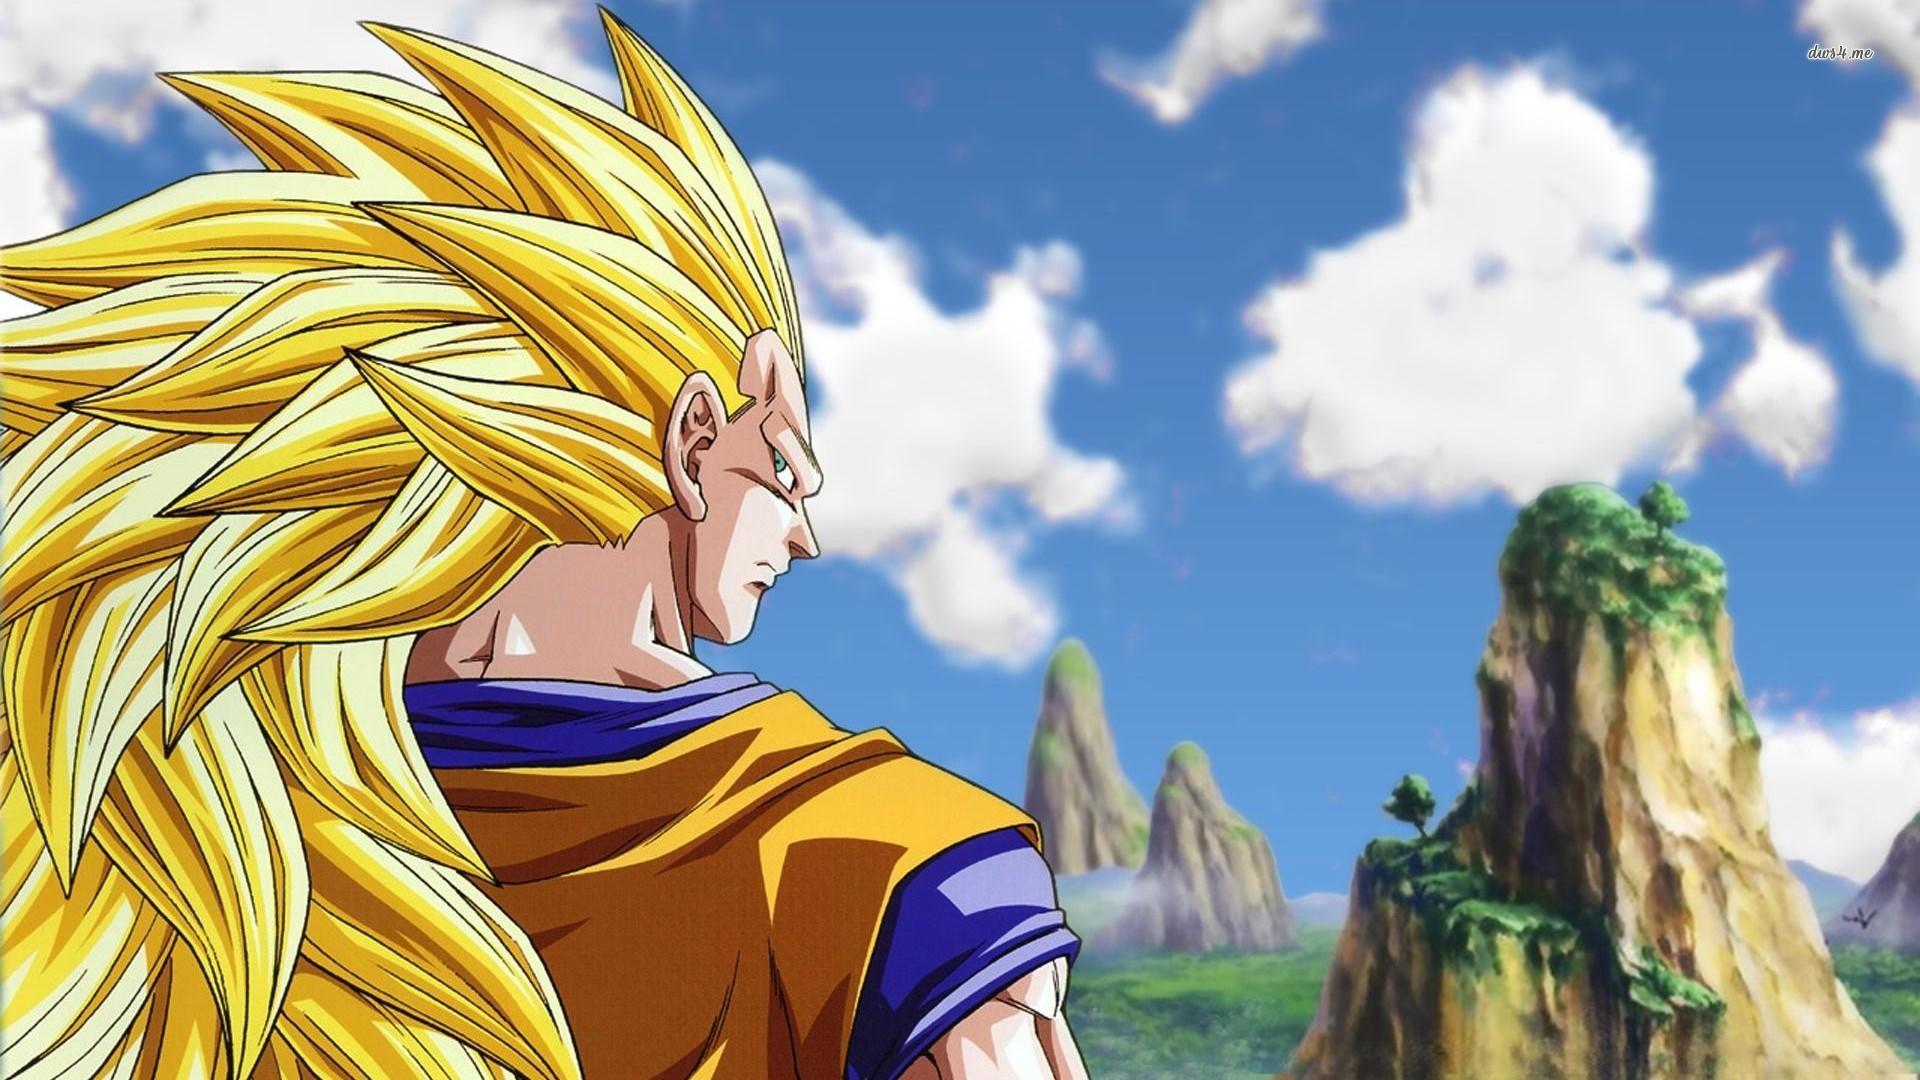 HD Super Saiyan 3 Goku Dragon Ball Z Wallpaper Full Size .